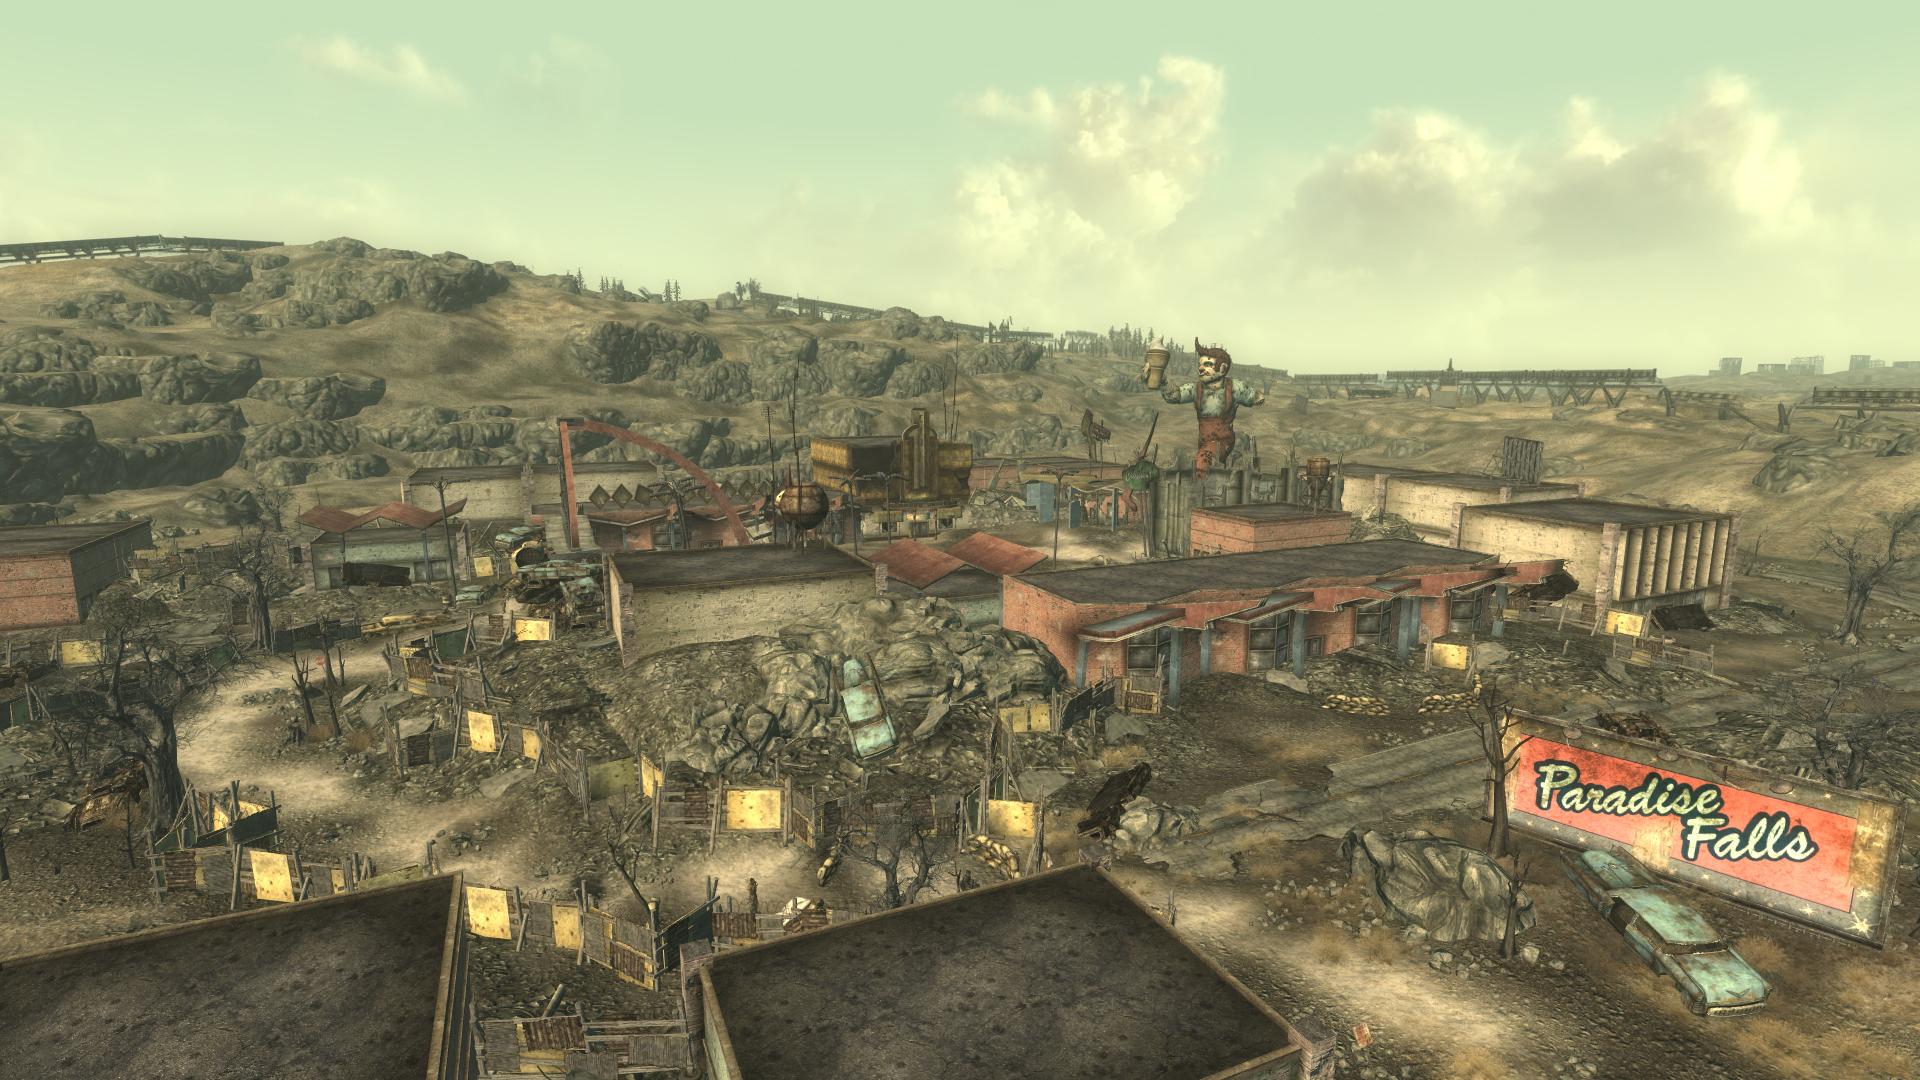 fallout 3 free slavers paradise falls